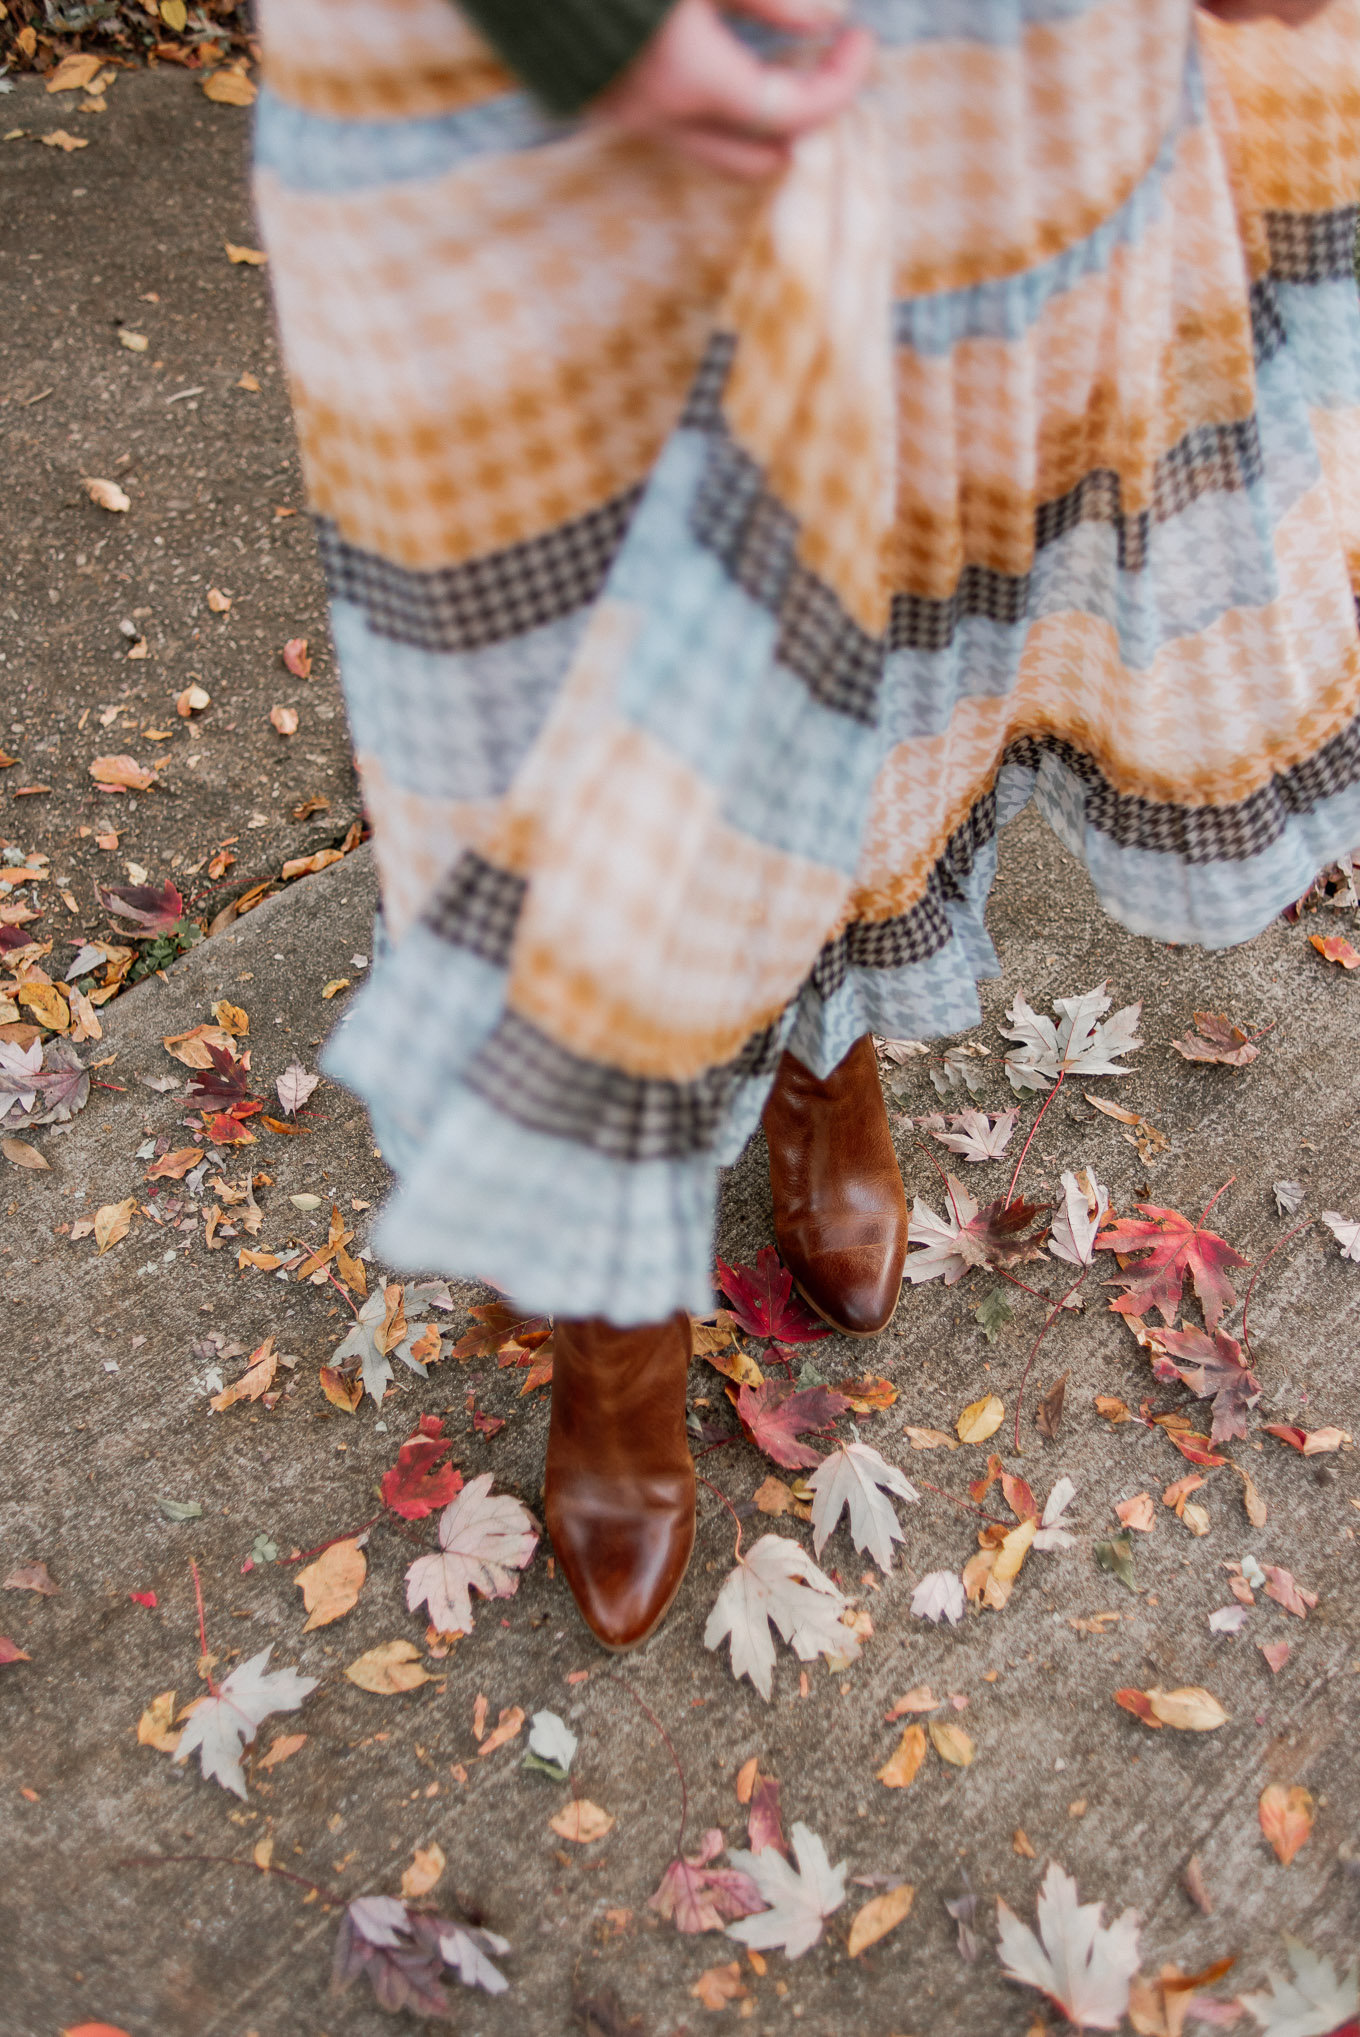 Plaid Midi Dress, Yellow Midi Dress, Leather Cognac Booties | Casual Fall Outfit Idea, Fall Midi Dress | Louella Reese